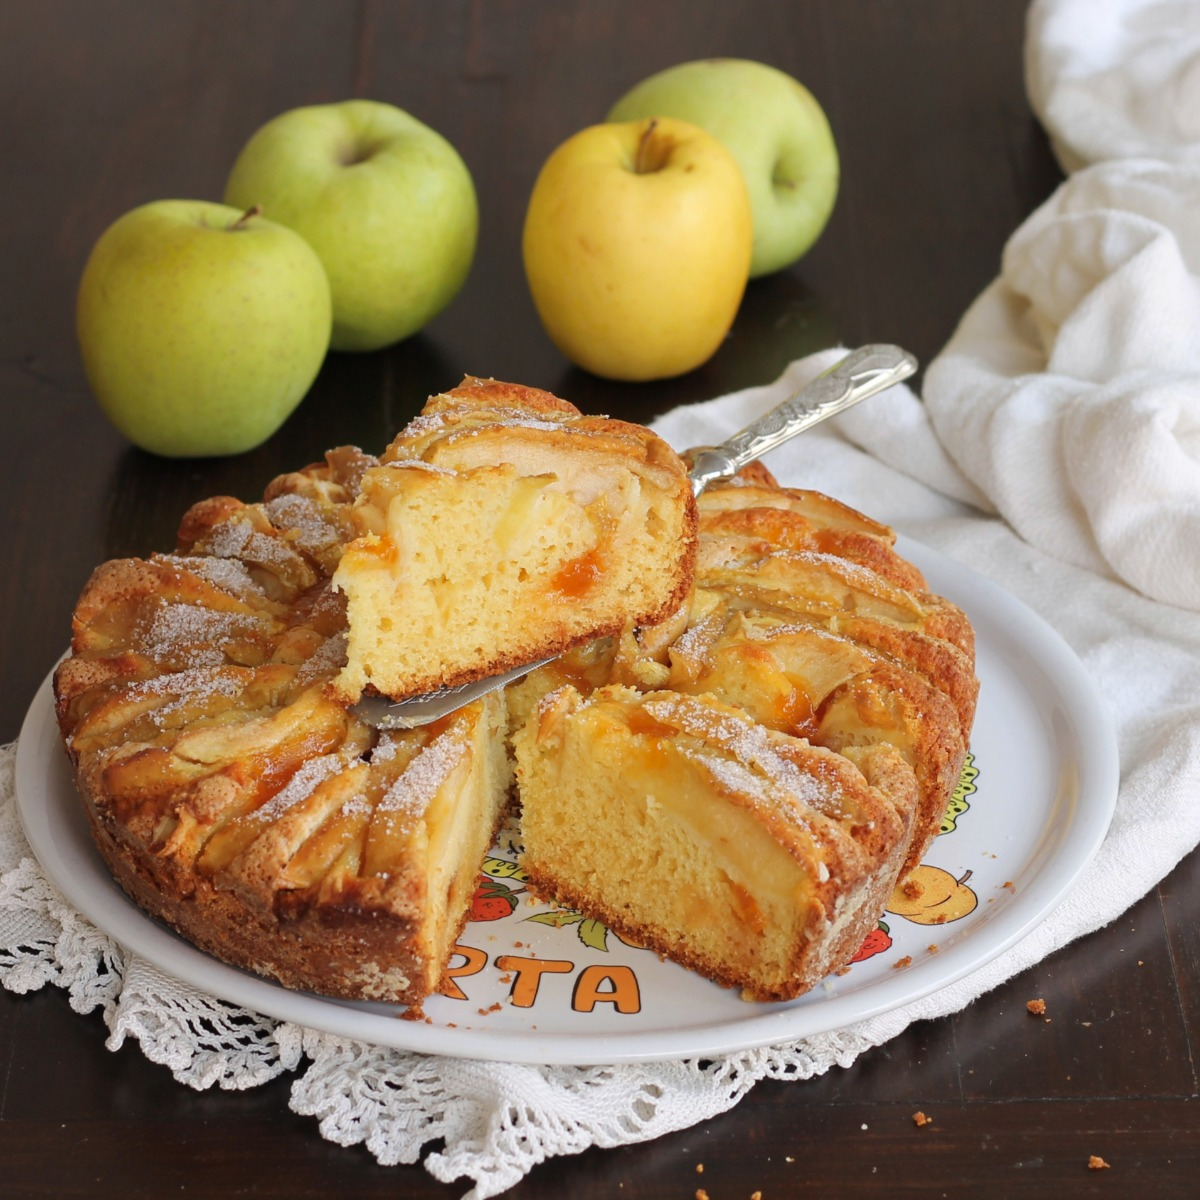 TORTA DI RICOTTA MELE E MARMELLATA ricetta dolce alle mele